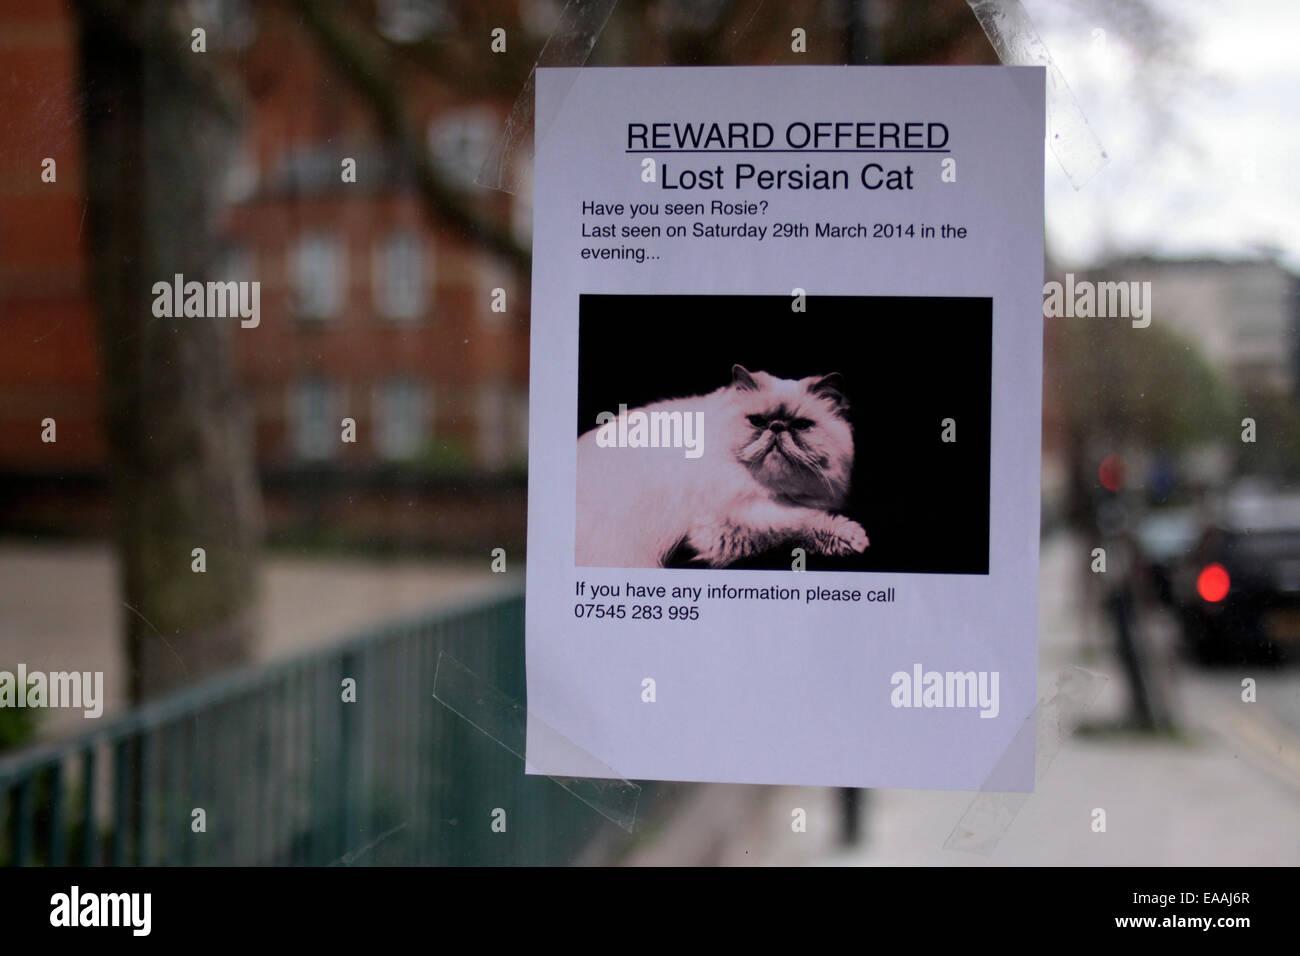 lost cat reward poster stock photos lost cat reward poster stock